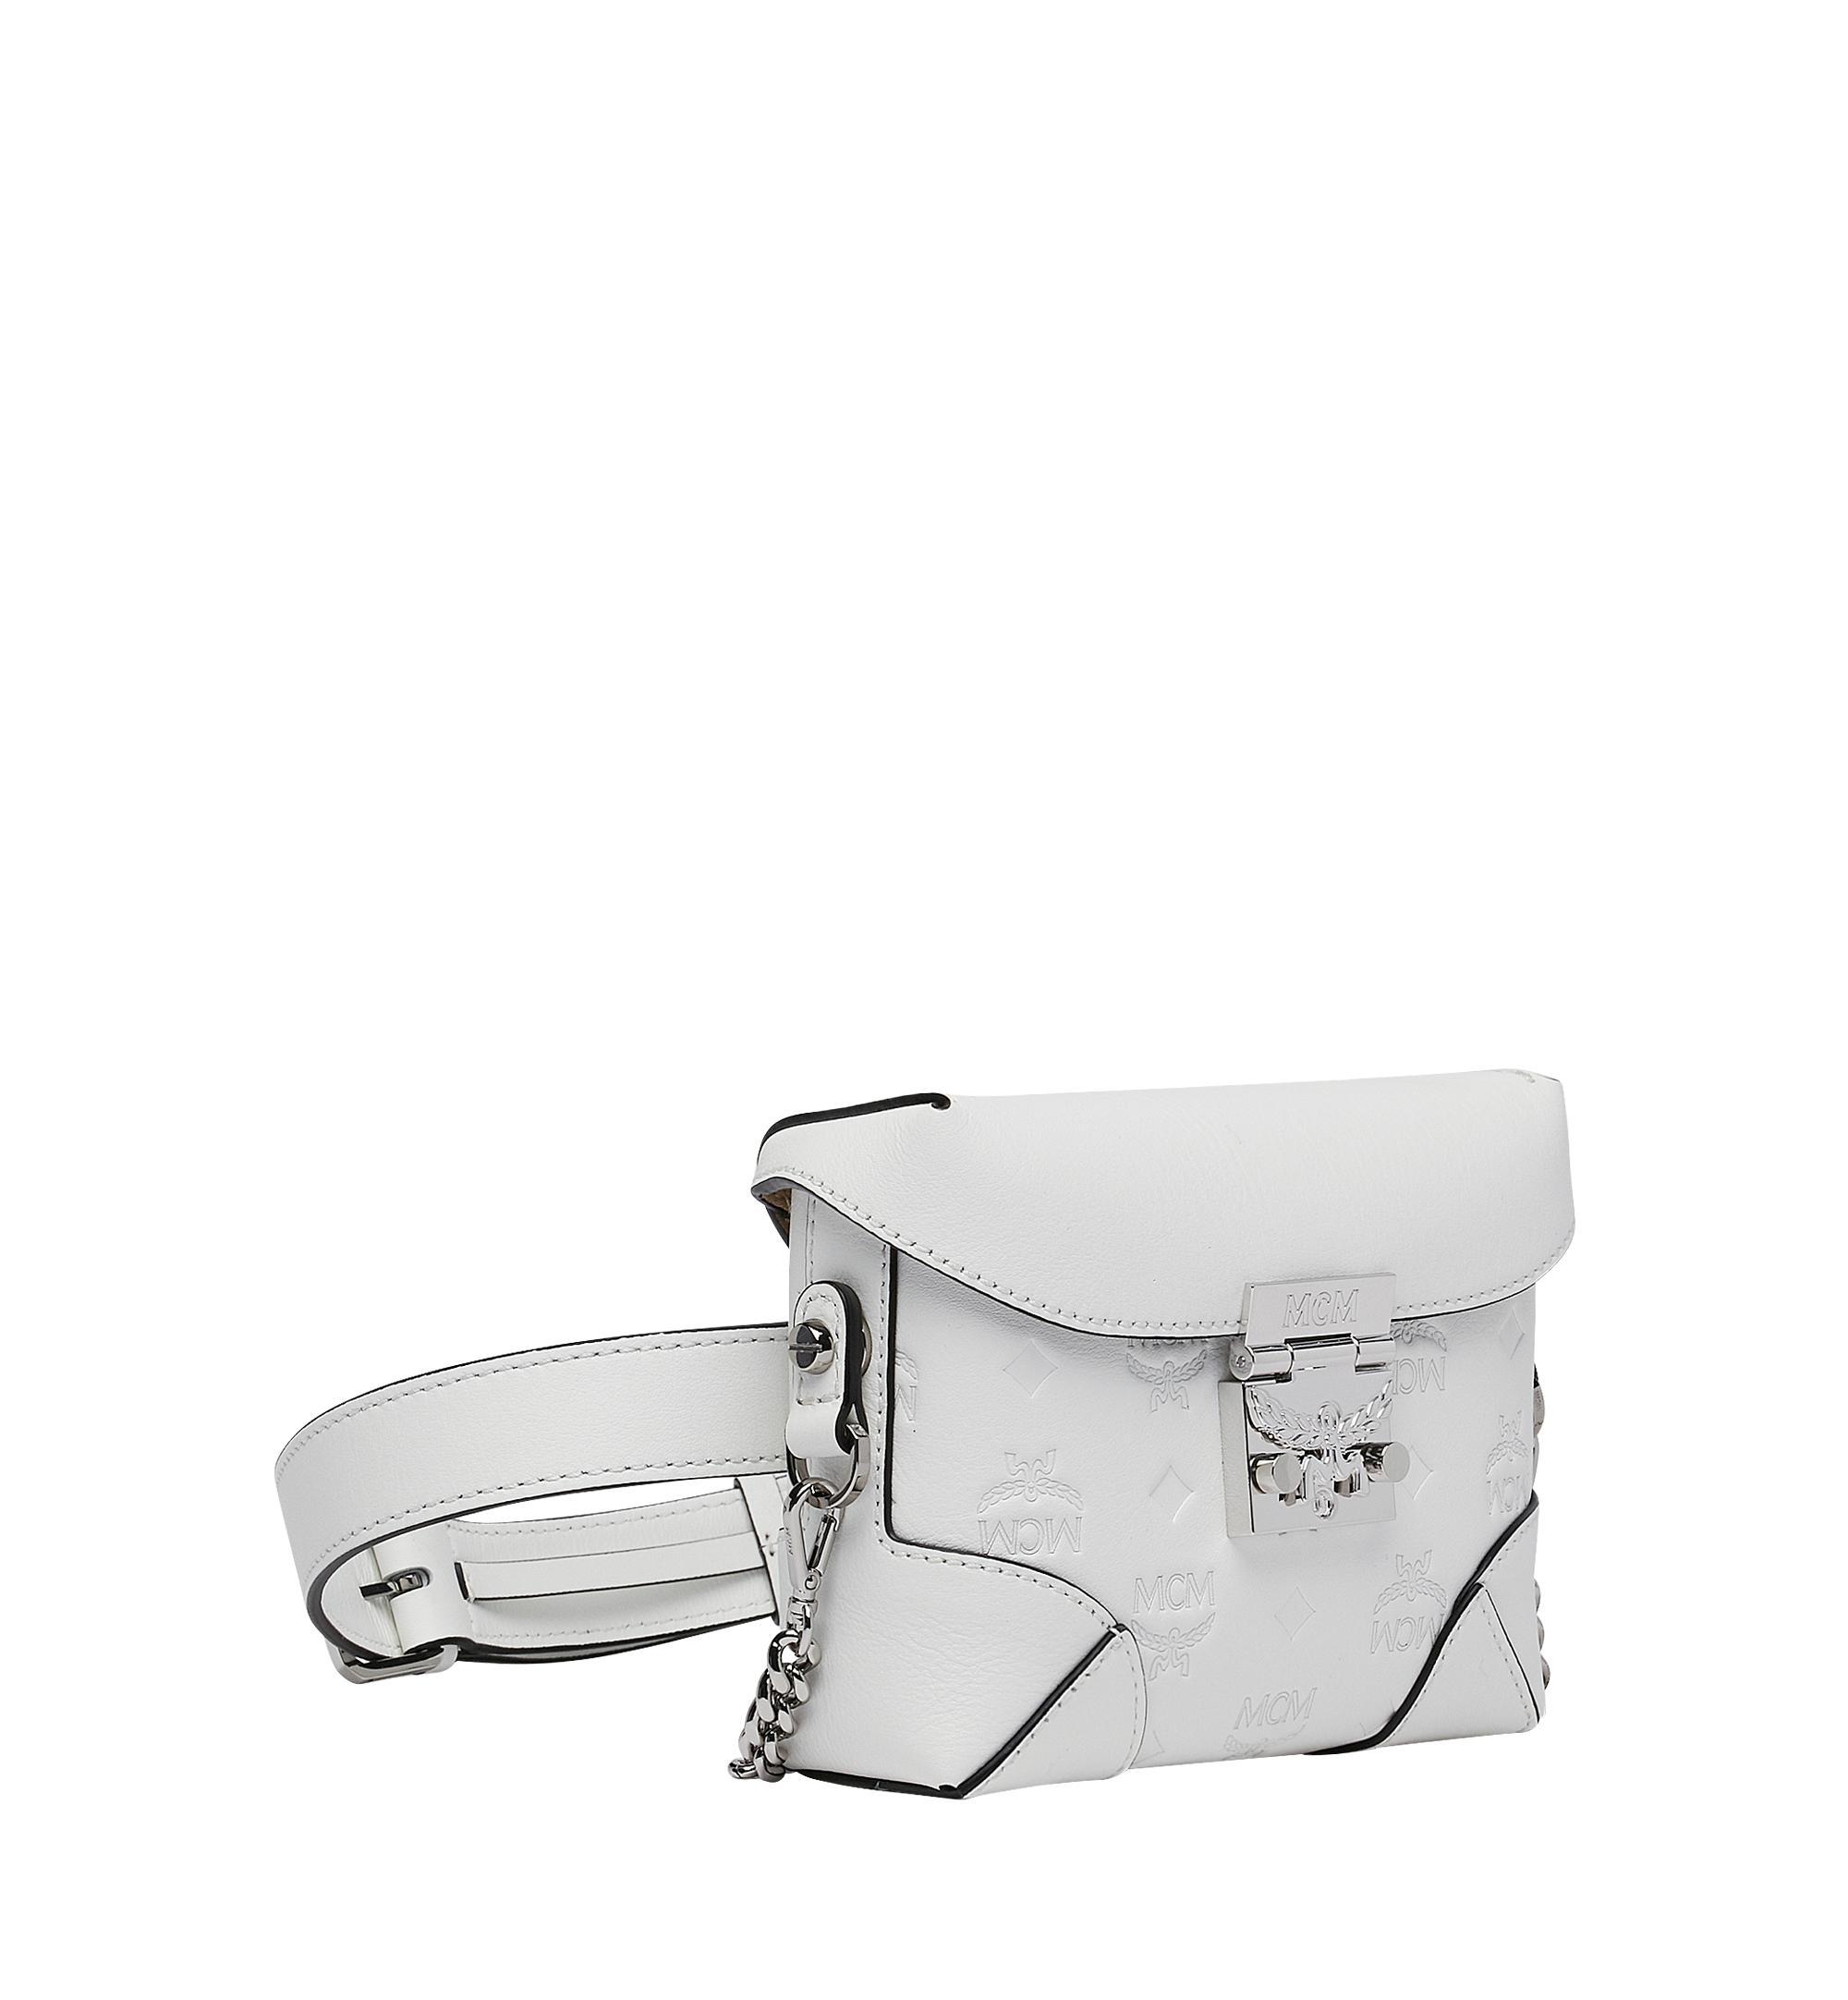 46db6ee29d76 Lyst - Mcm Soft Berlin Monogrammed Leather Belt Bag in White